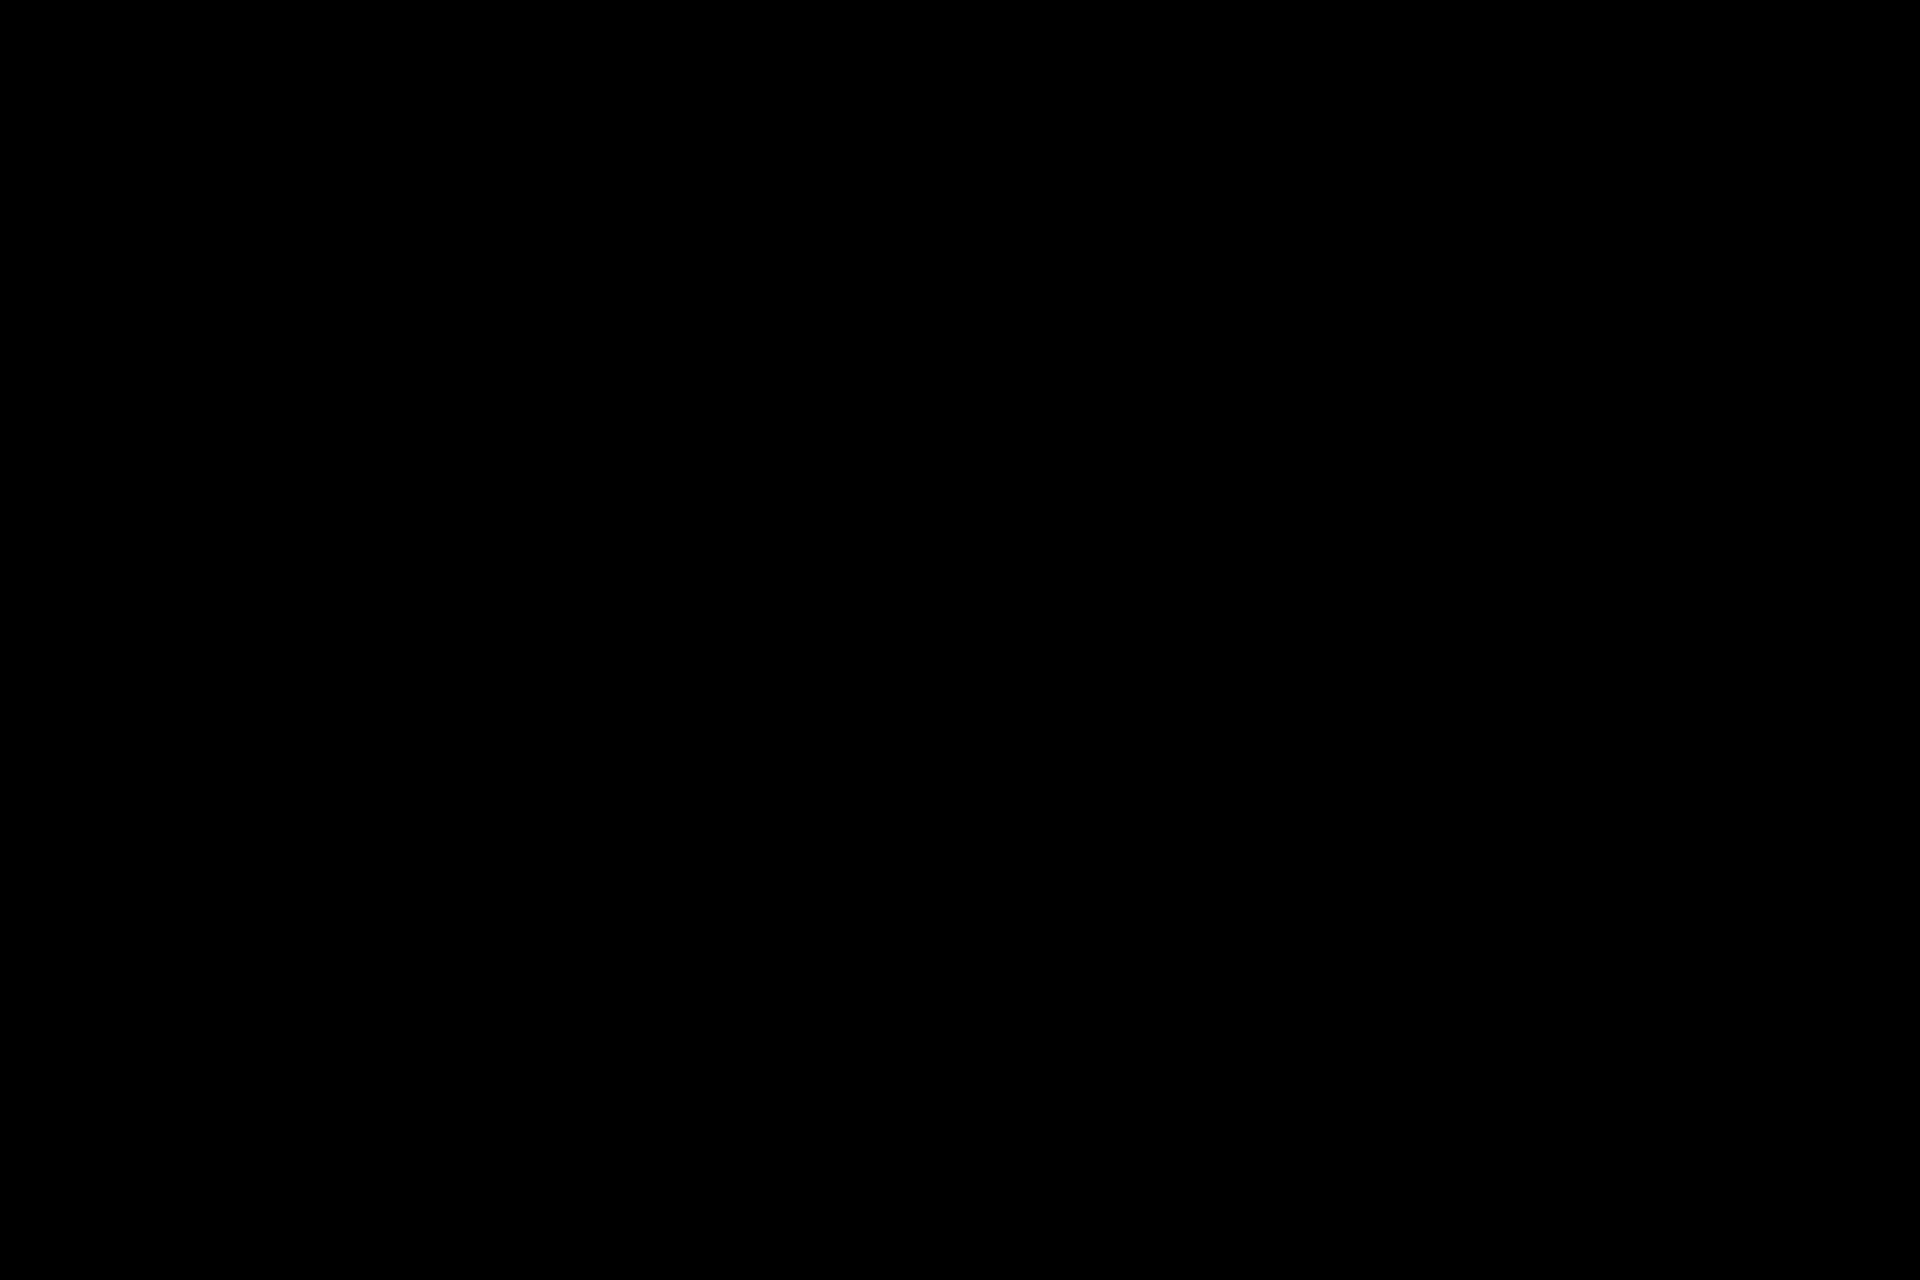 dornbracht referenz jentner metallveredelung logo sw